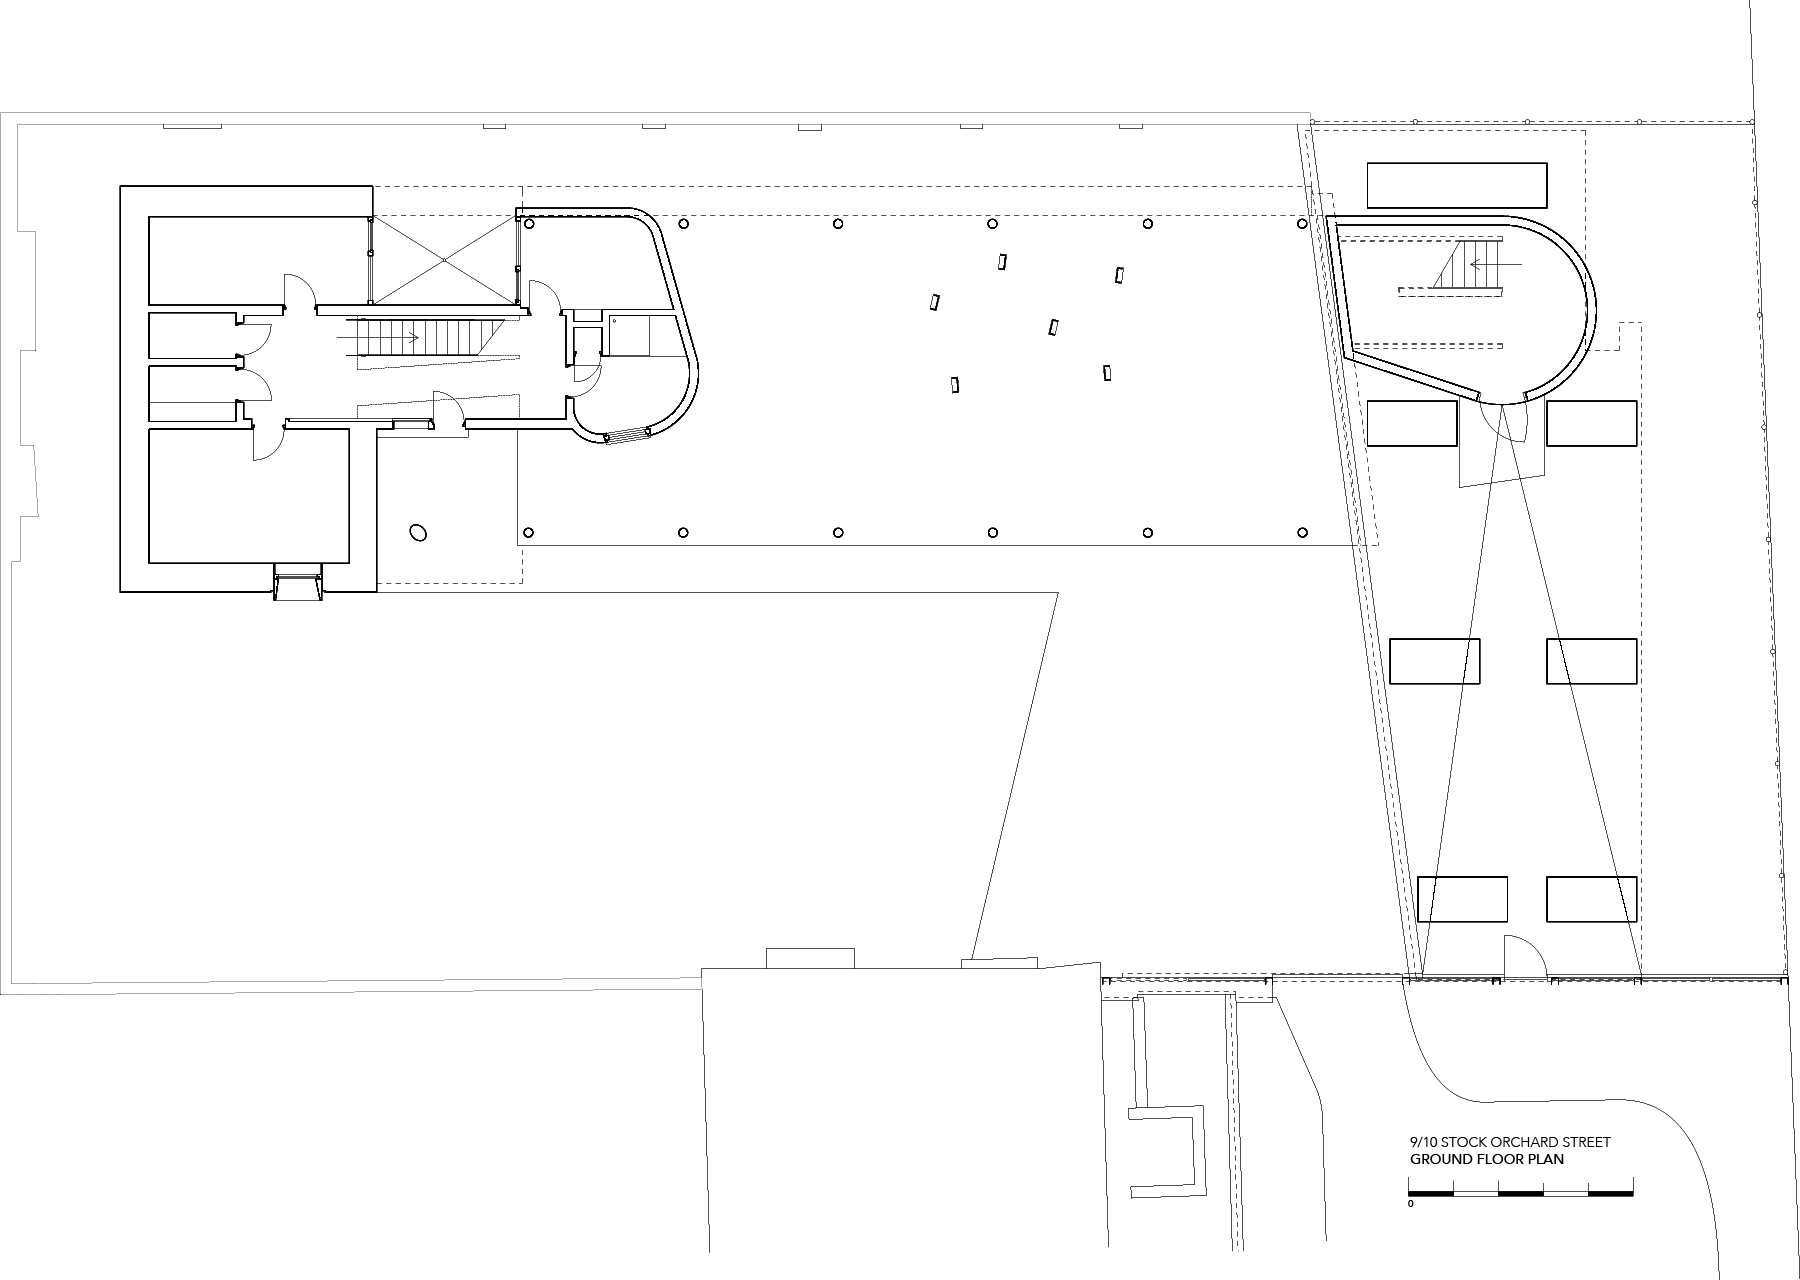 Sarah-Wigglesworth-Architects Stock-Orchard-Street ground-floor-plan 1800